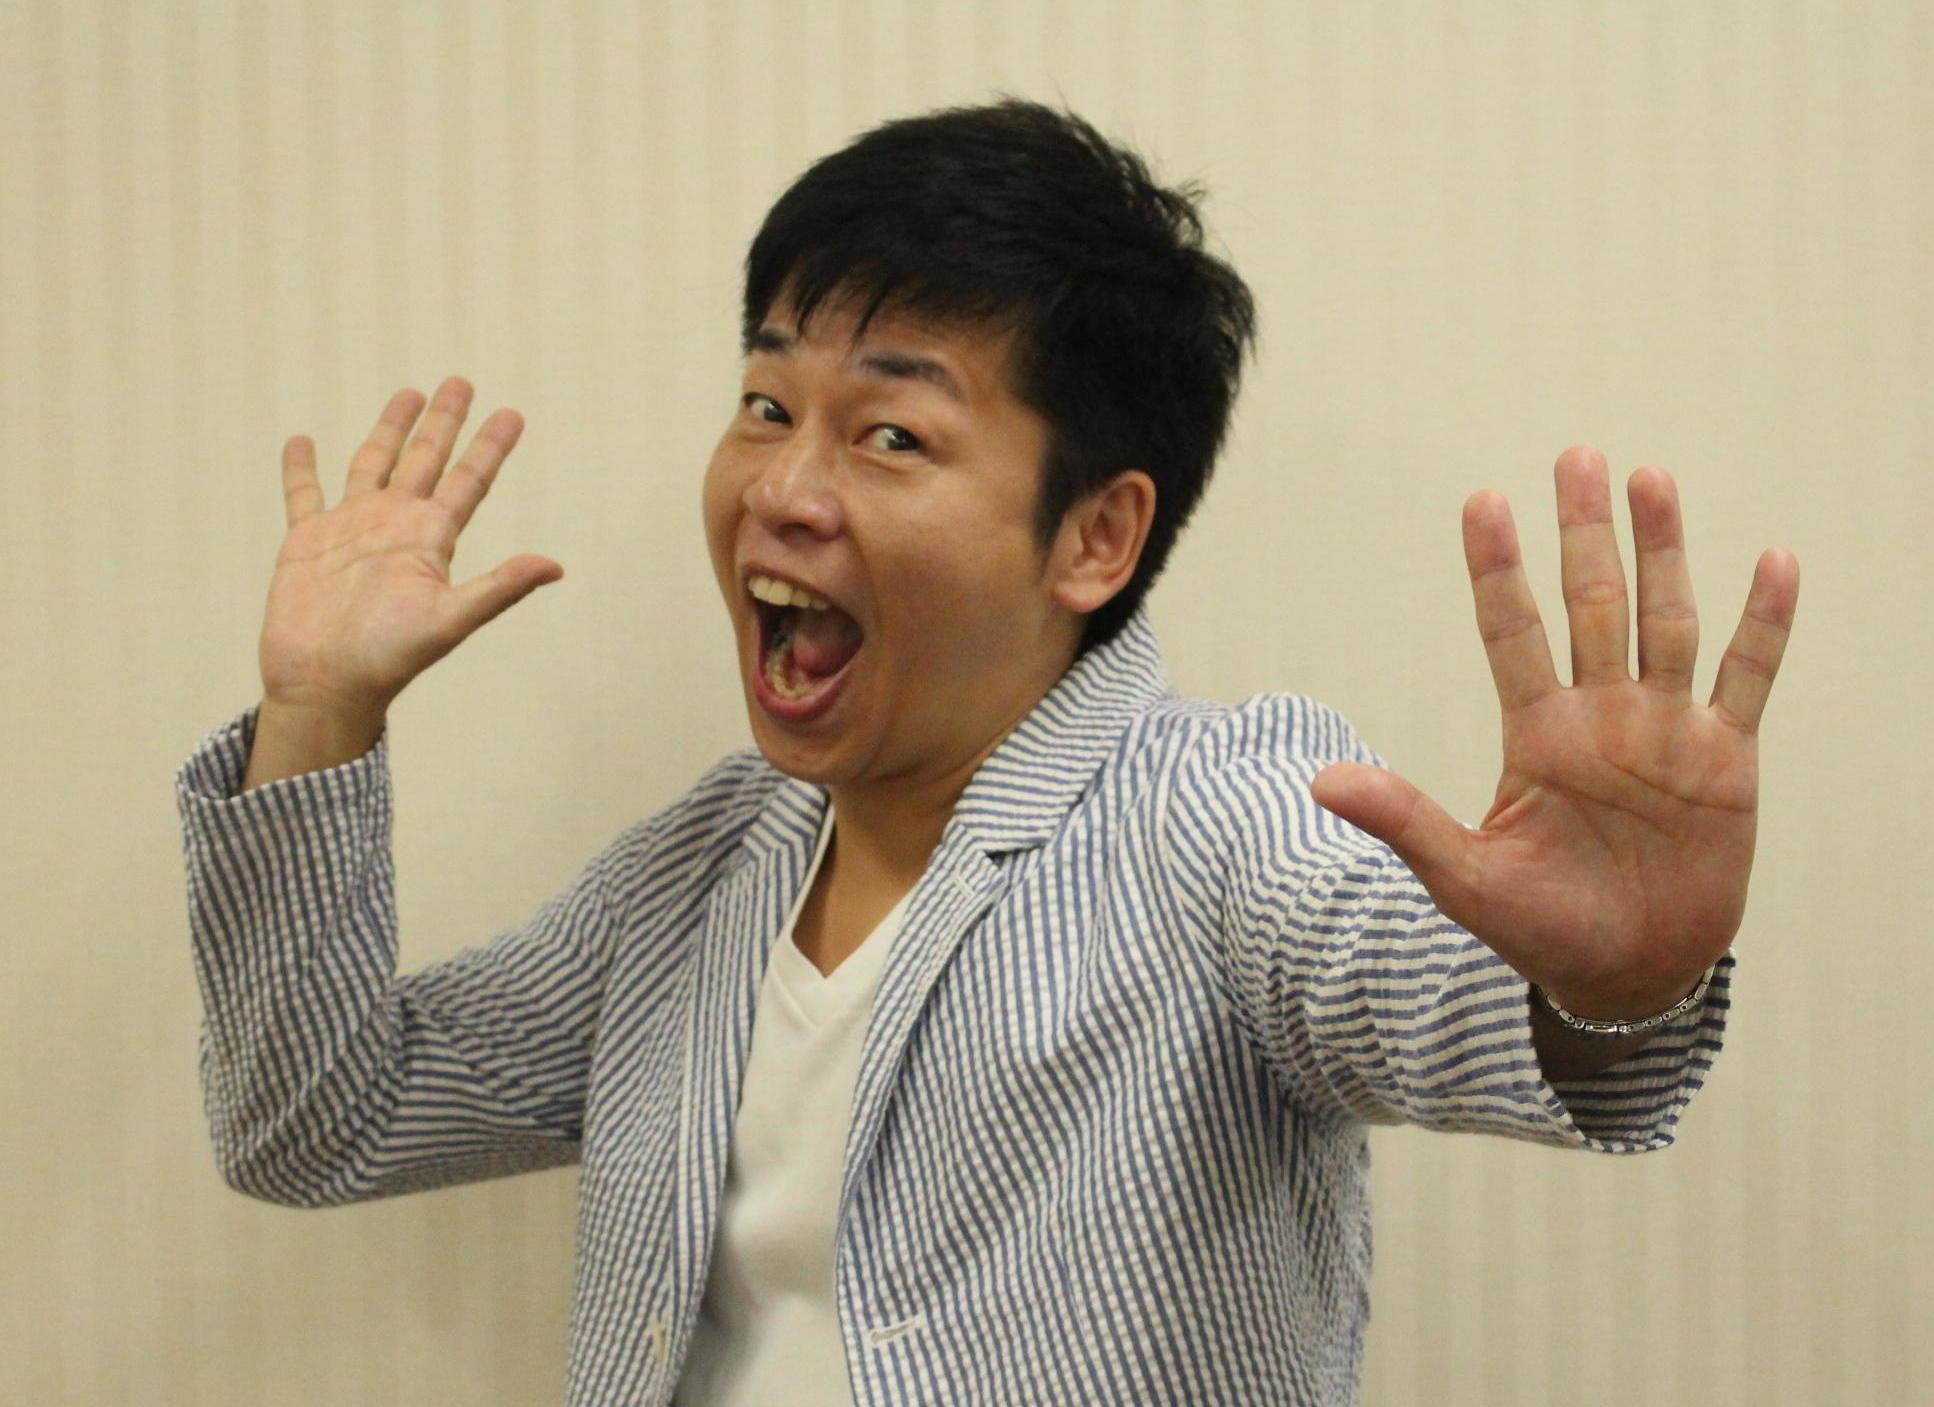 http://47web.jp/shizuoka/uploads/IMG_7385.JPG